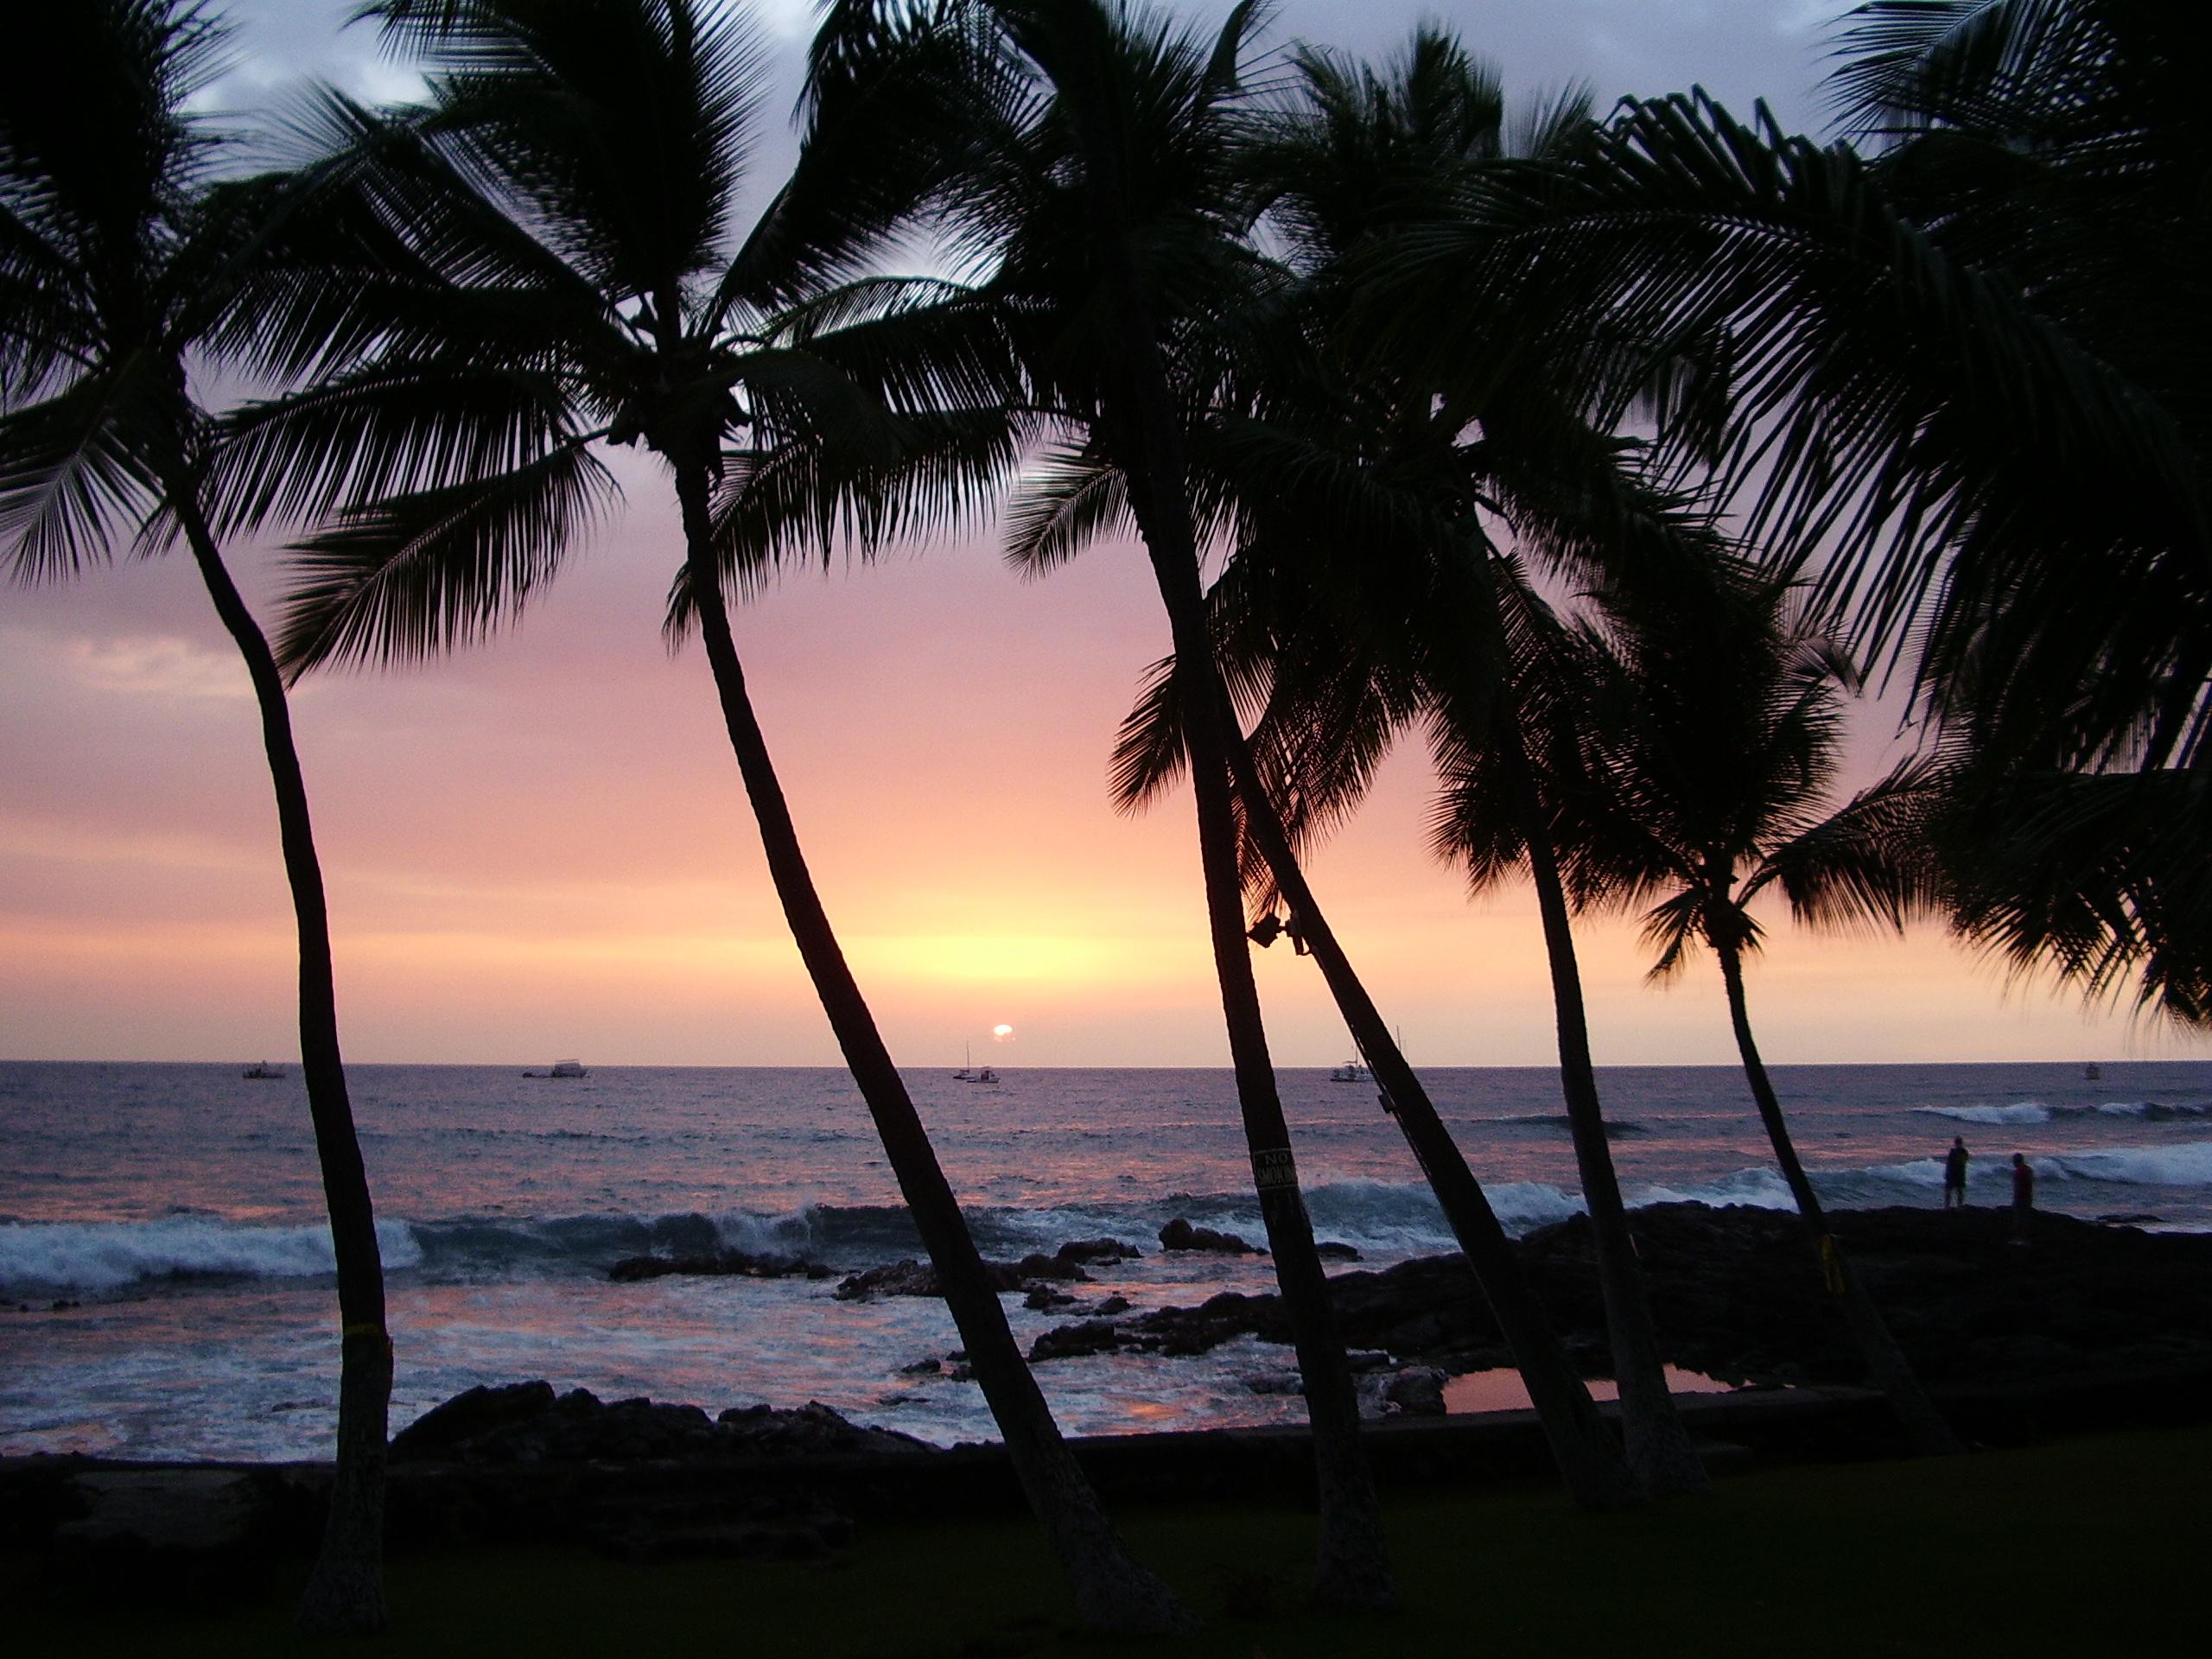 Kailua kona hi time